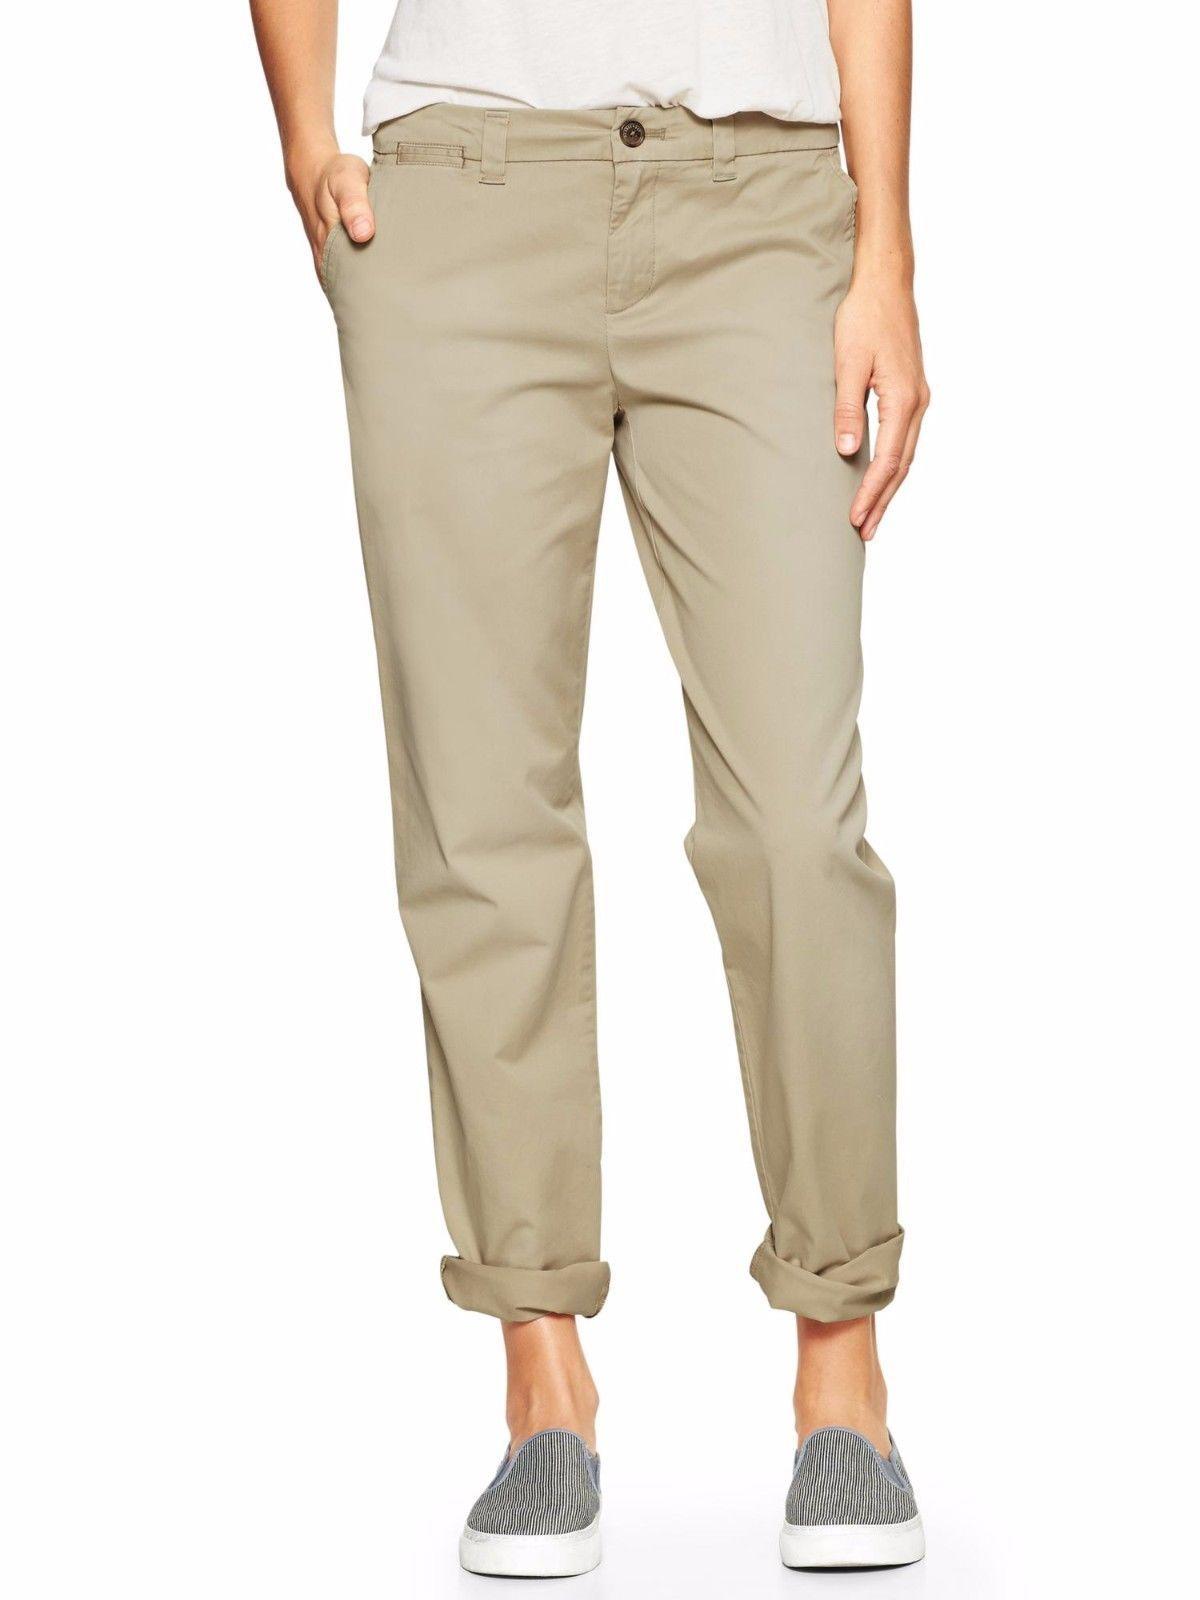 Gap Inv1 Nwt Products Womens Pants 30 In Broken Ins Khaki q8fB56x8